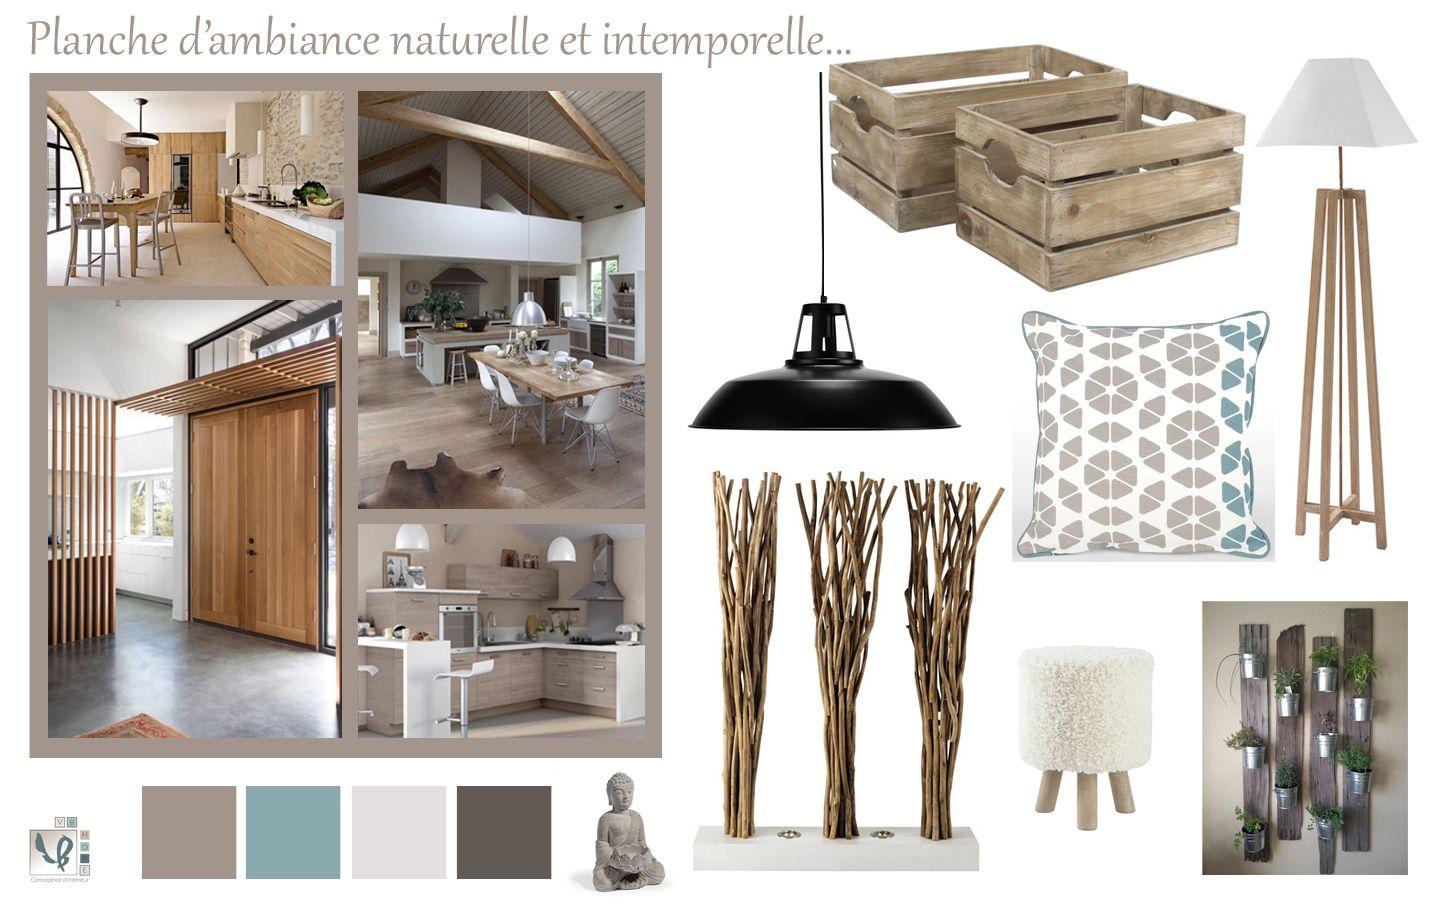 Planche Tendance Naturelle Et Intemporelle Vb Home Vb